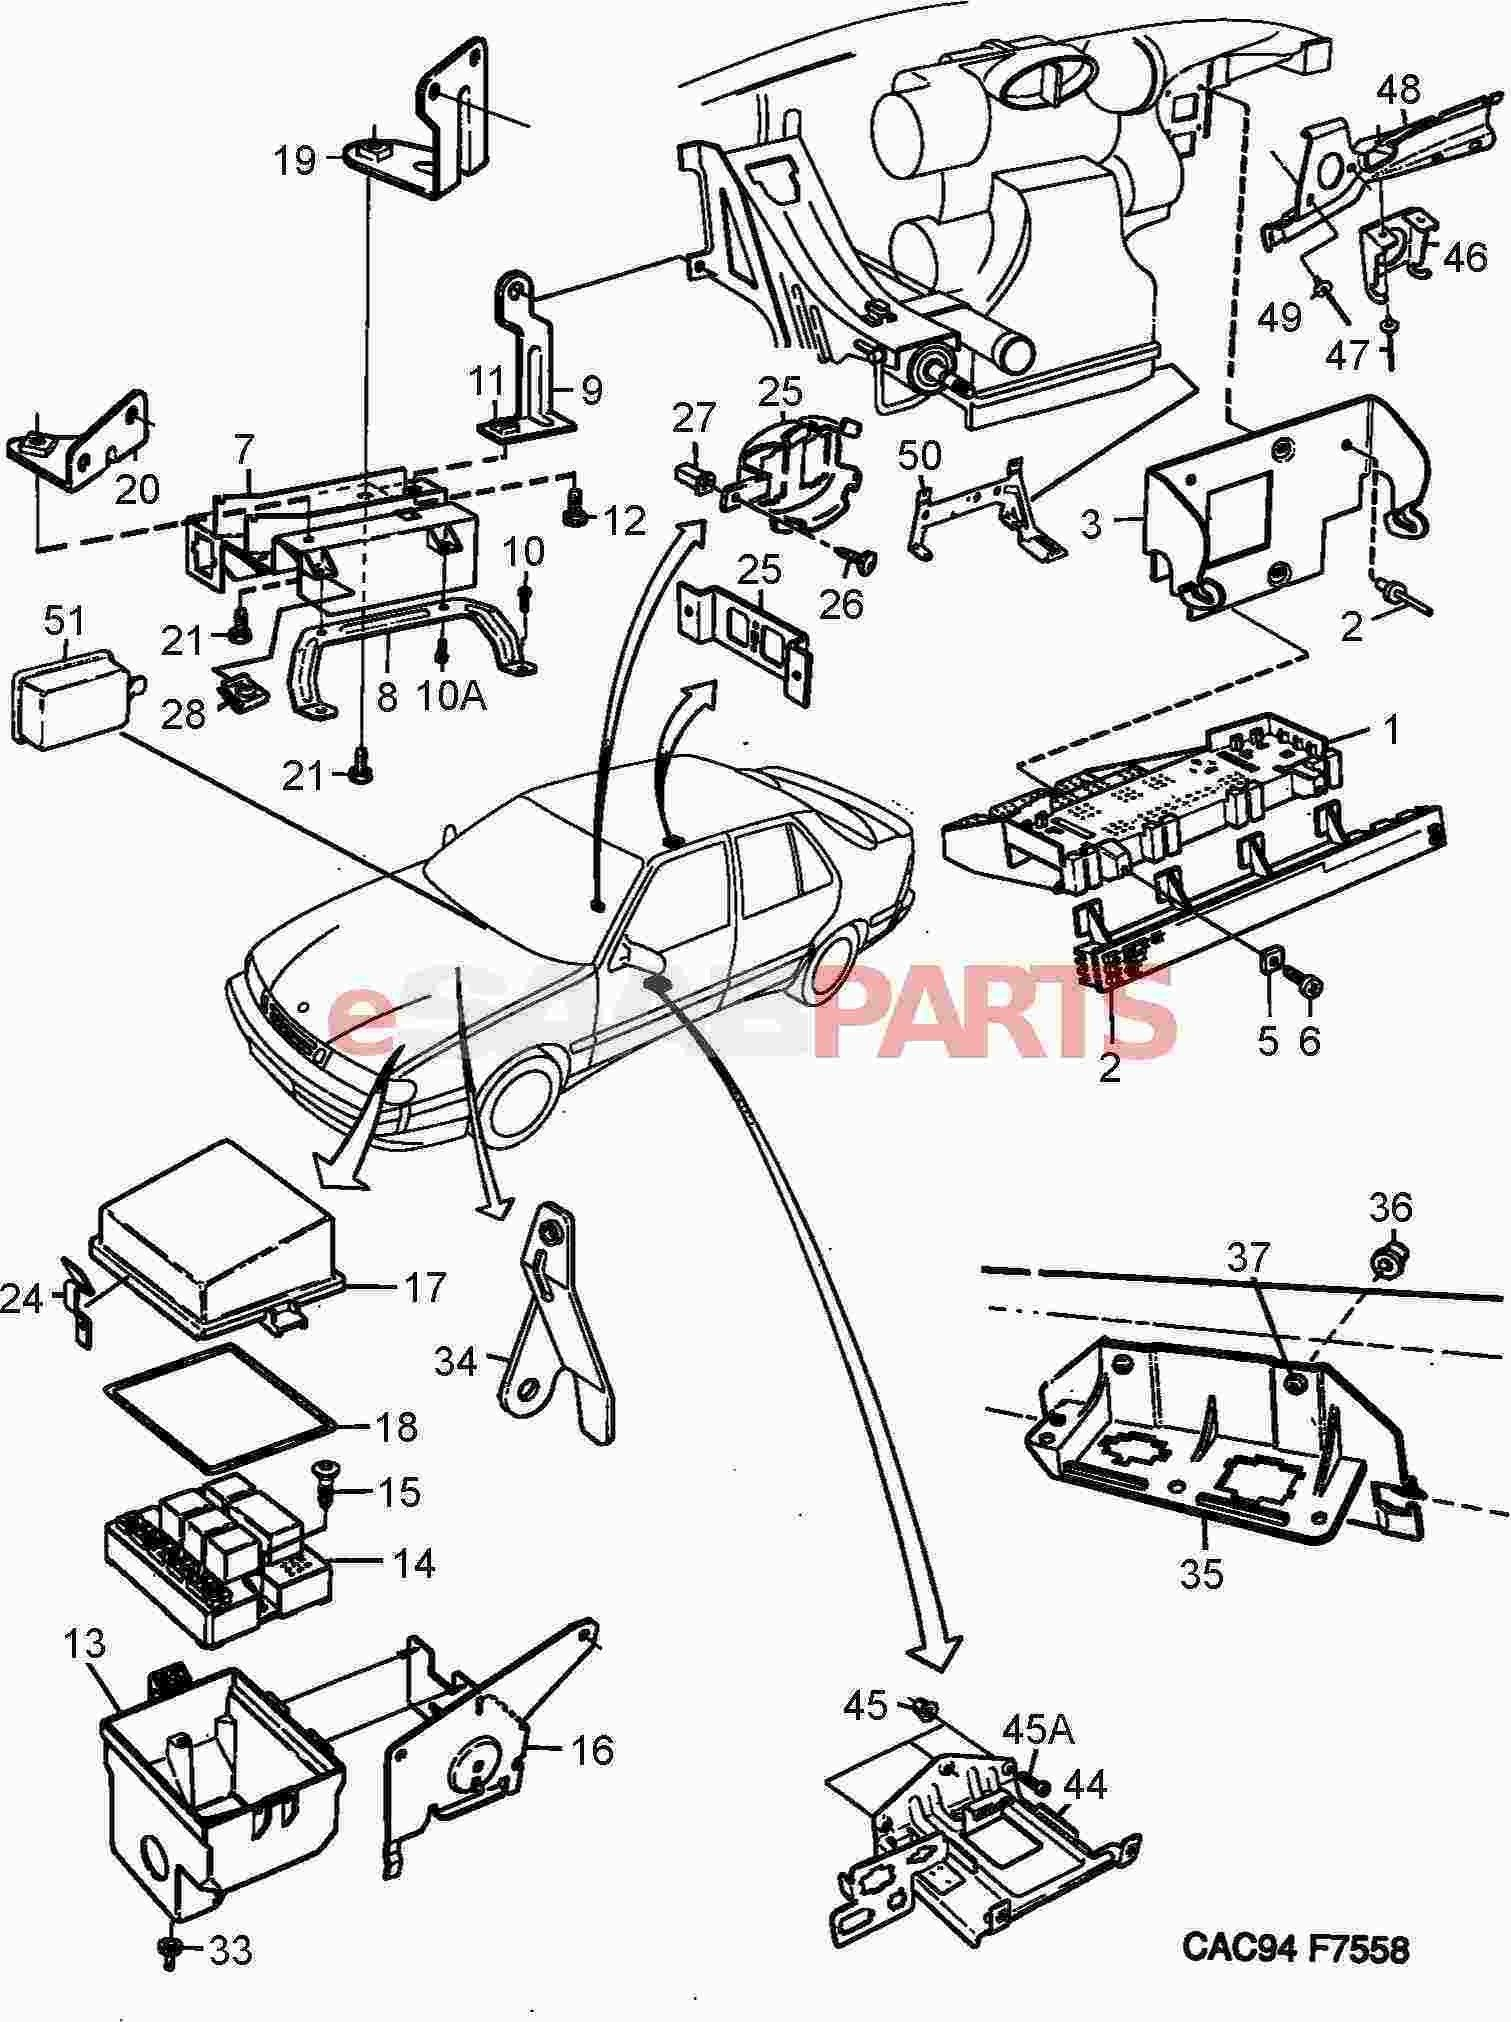 Lt1 Pcm Wiring Diagram